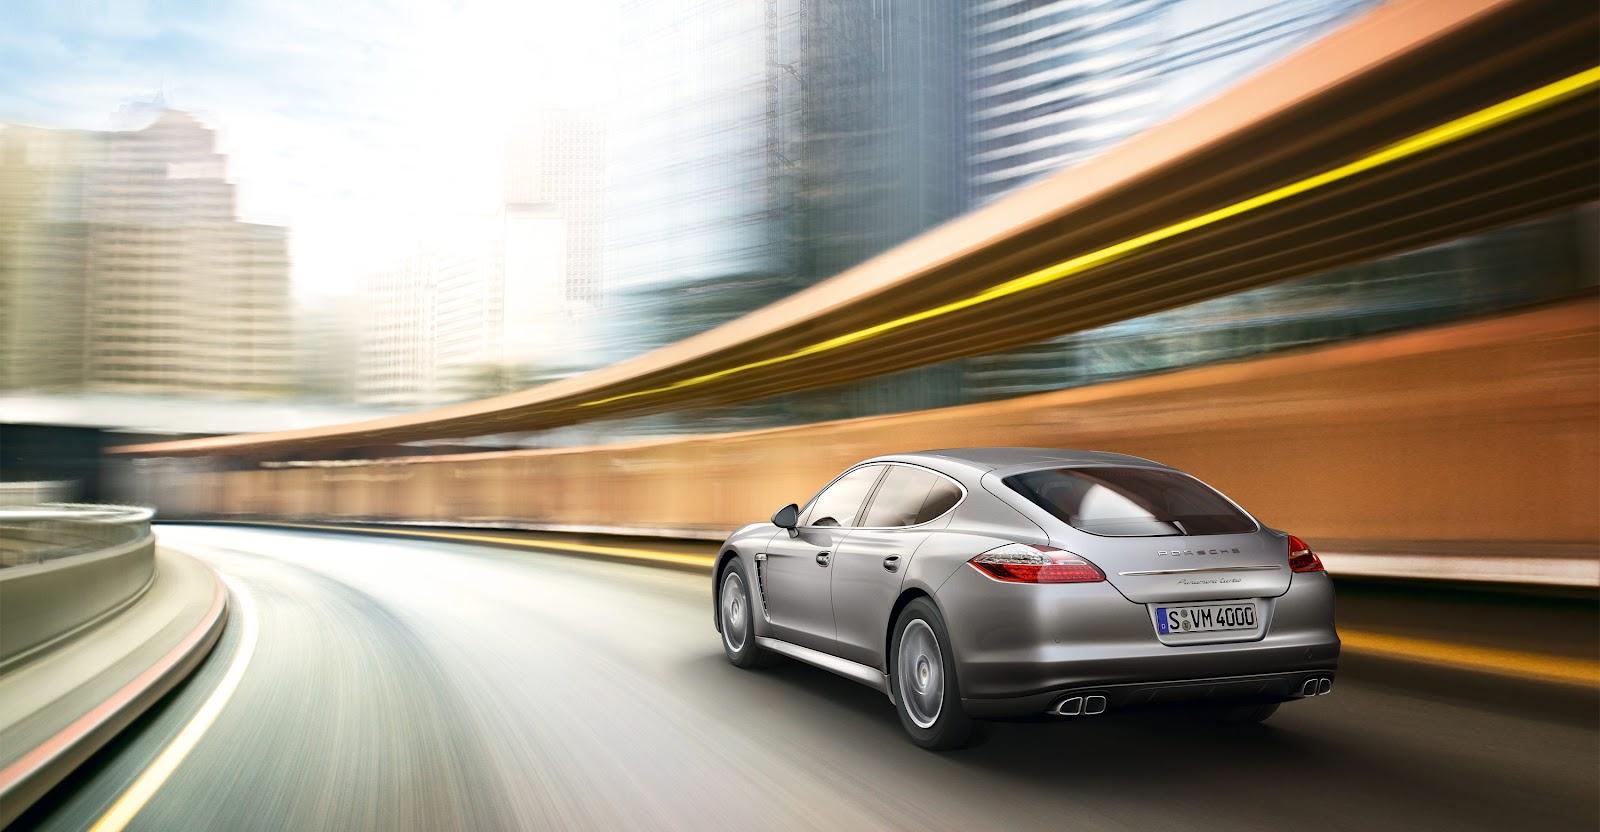 Auto Opinião: Porsche Panamera Turbo 2009 - Análise